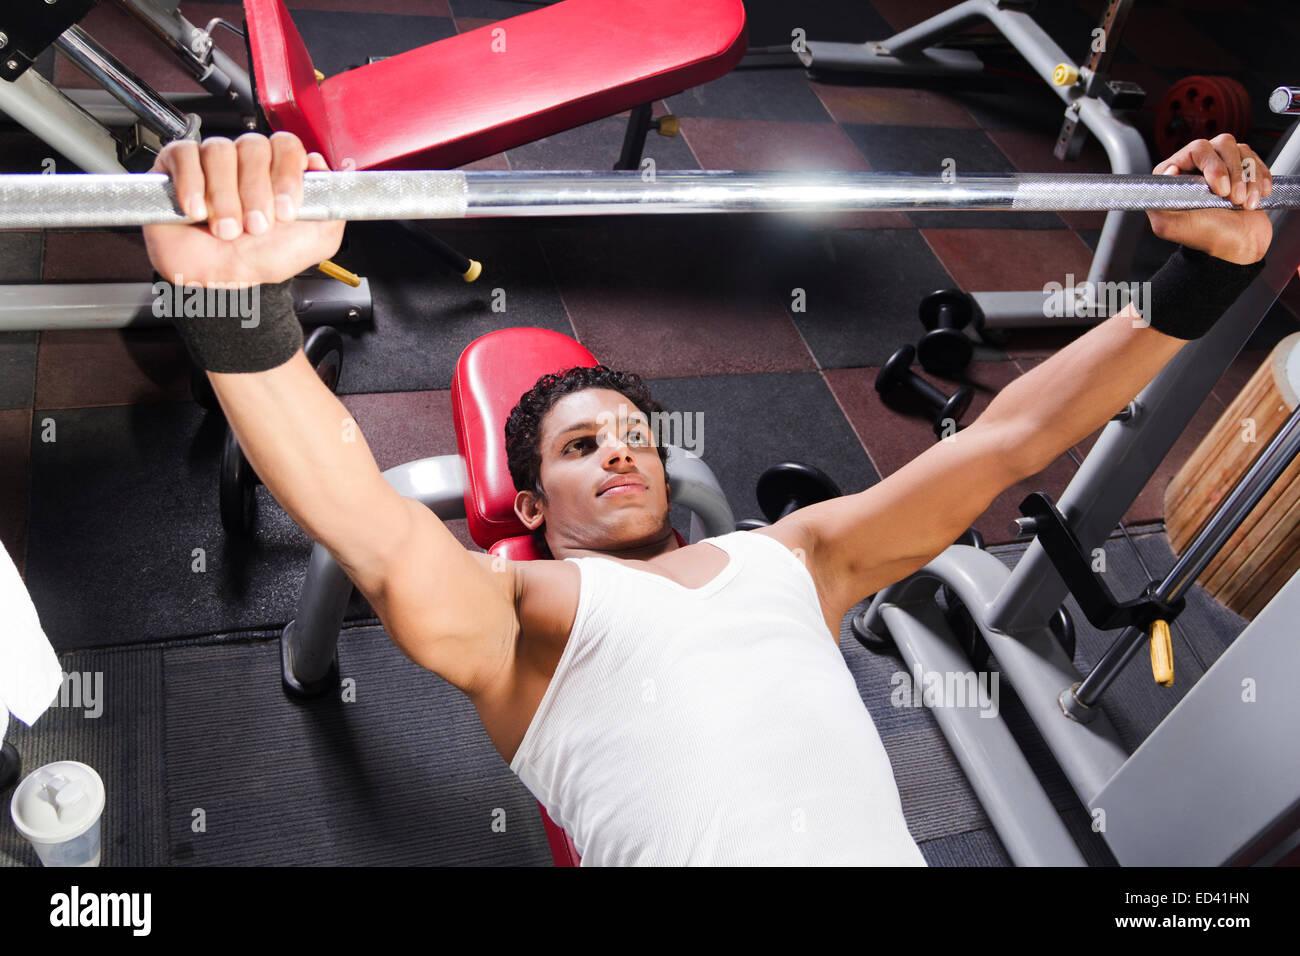 1 indian man gym Body Building Stock Photo: 76921089 - Alamy